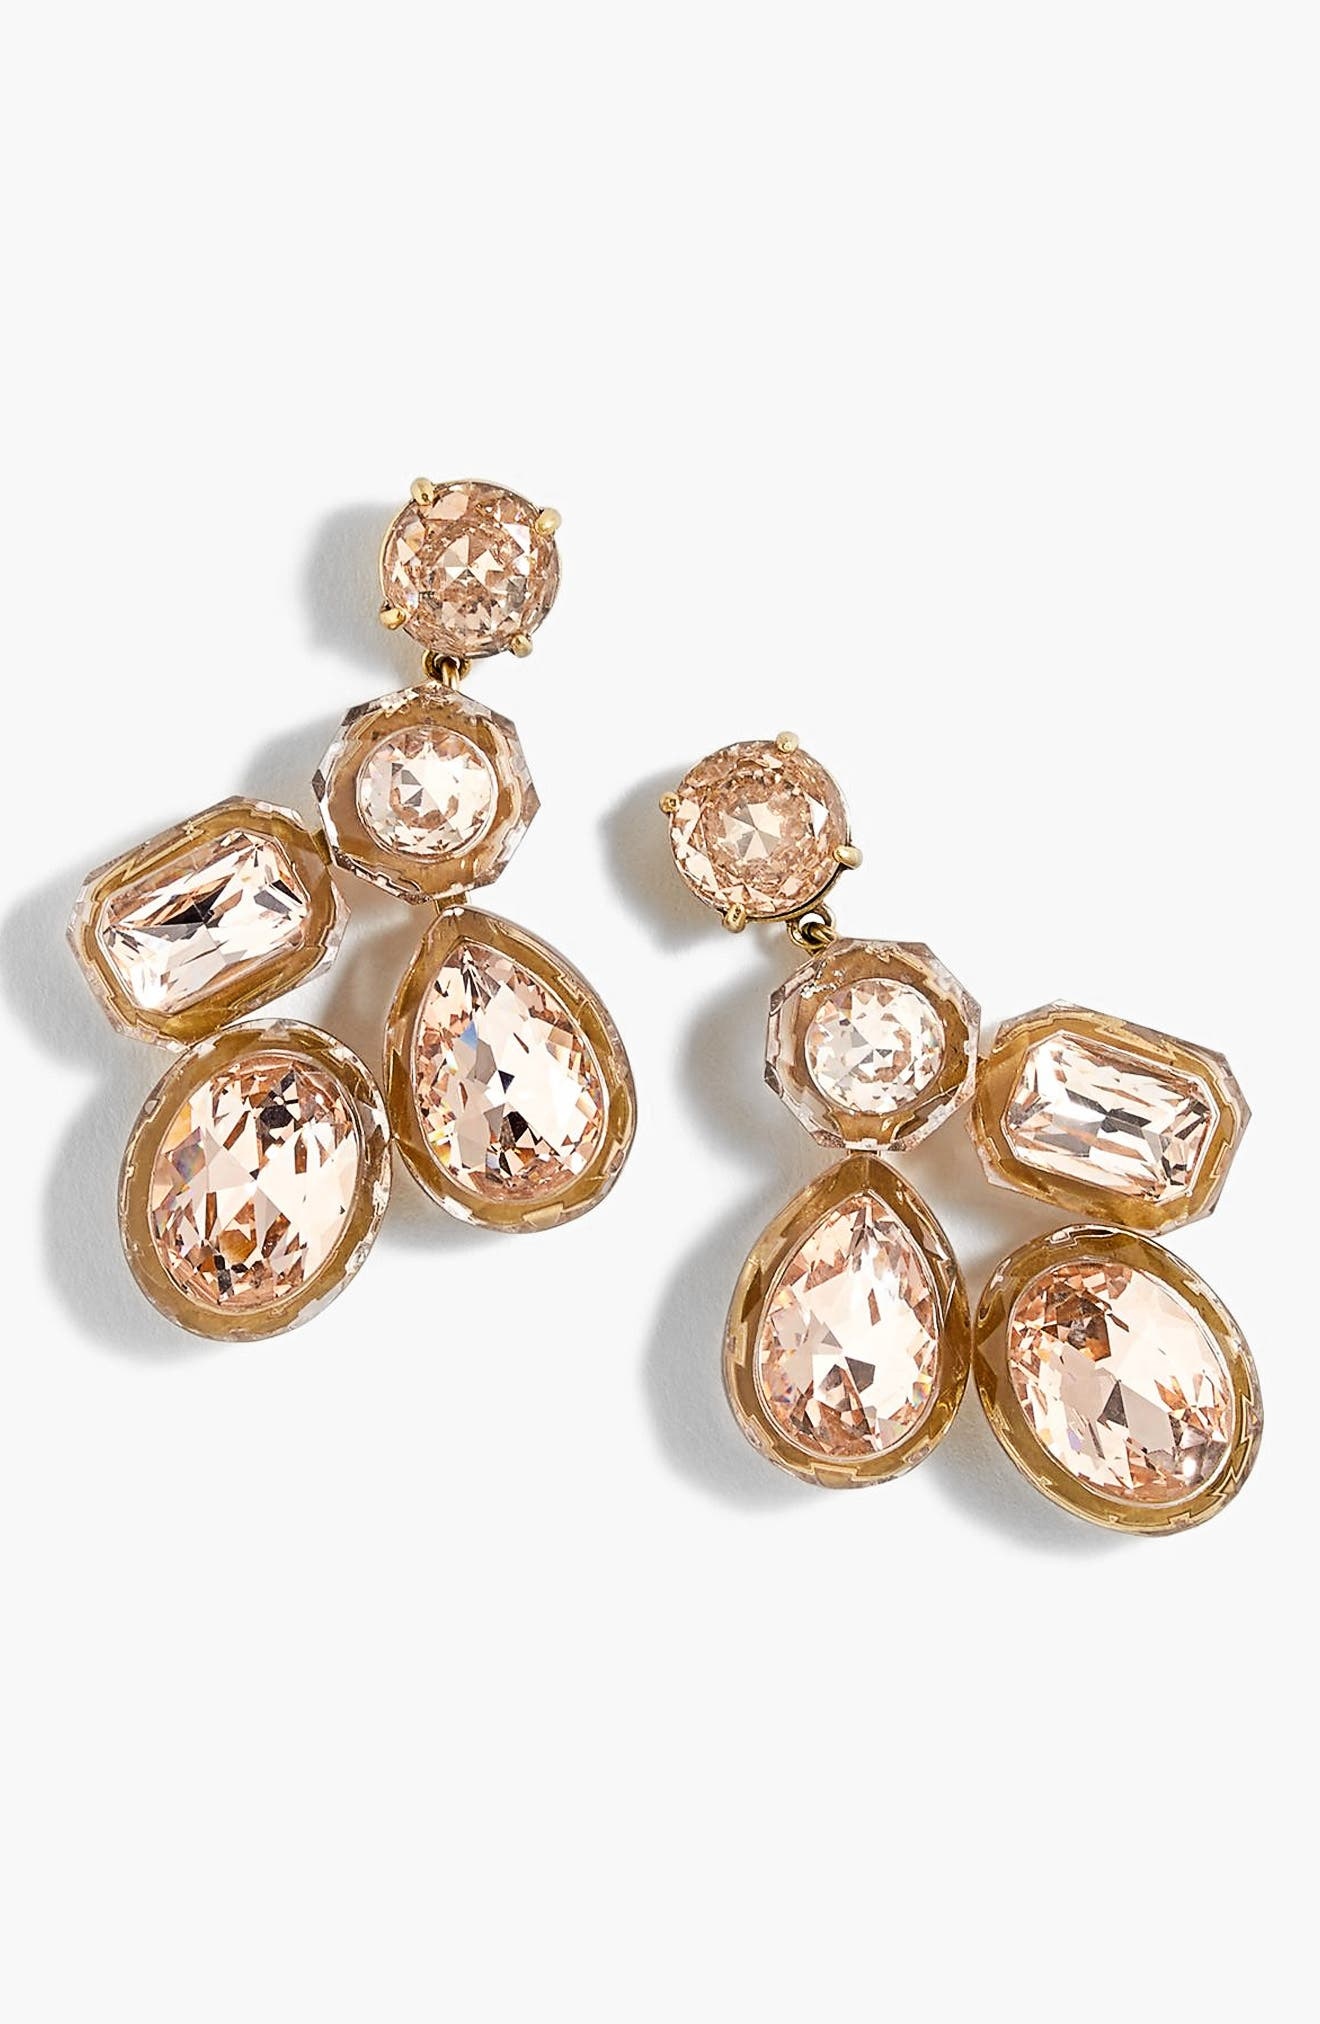 Alternate Image 1 Selected - J.Crew Jewel Box Cluster Earrings